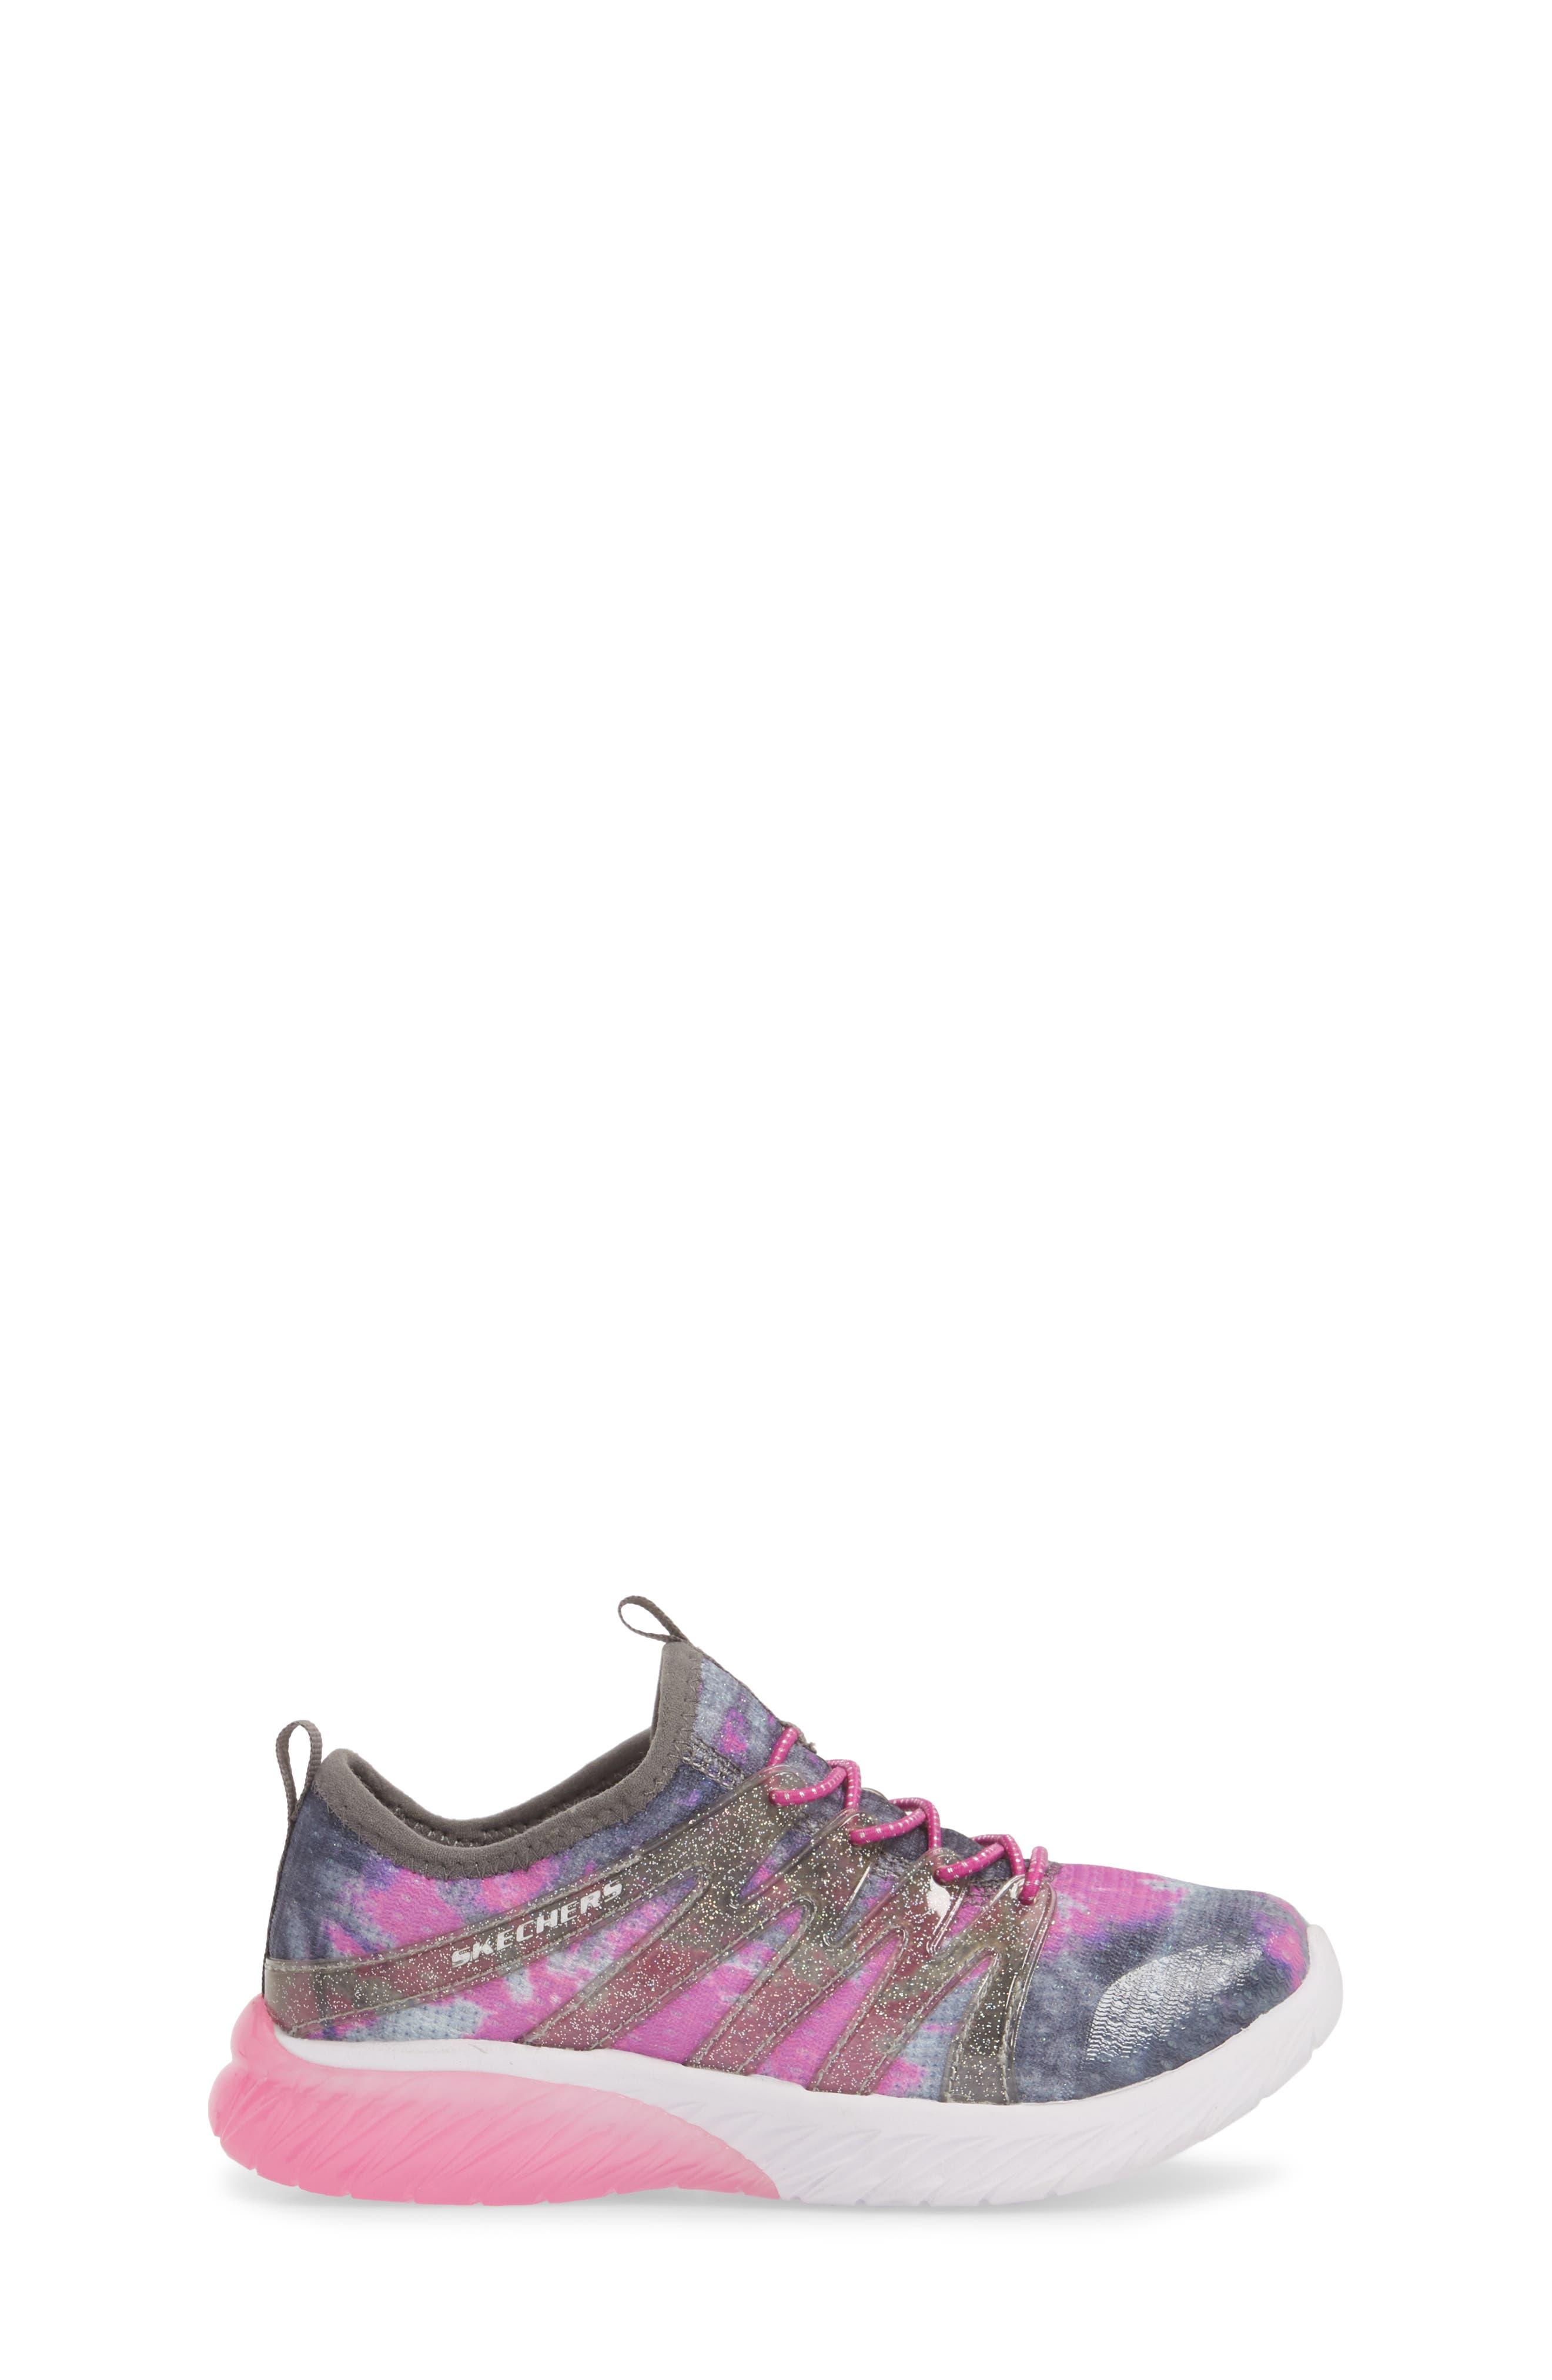 Skech Gem Glitter Sneaker,                             Alternate thumbnail 3, color,                             Charcoal/ Hot Pink